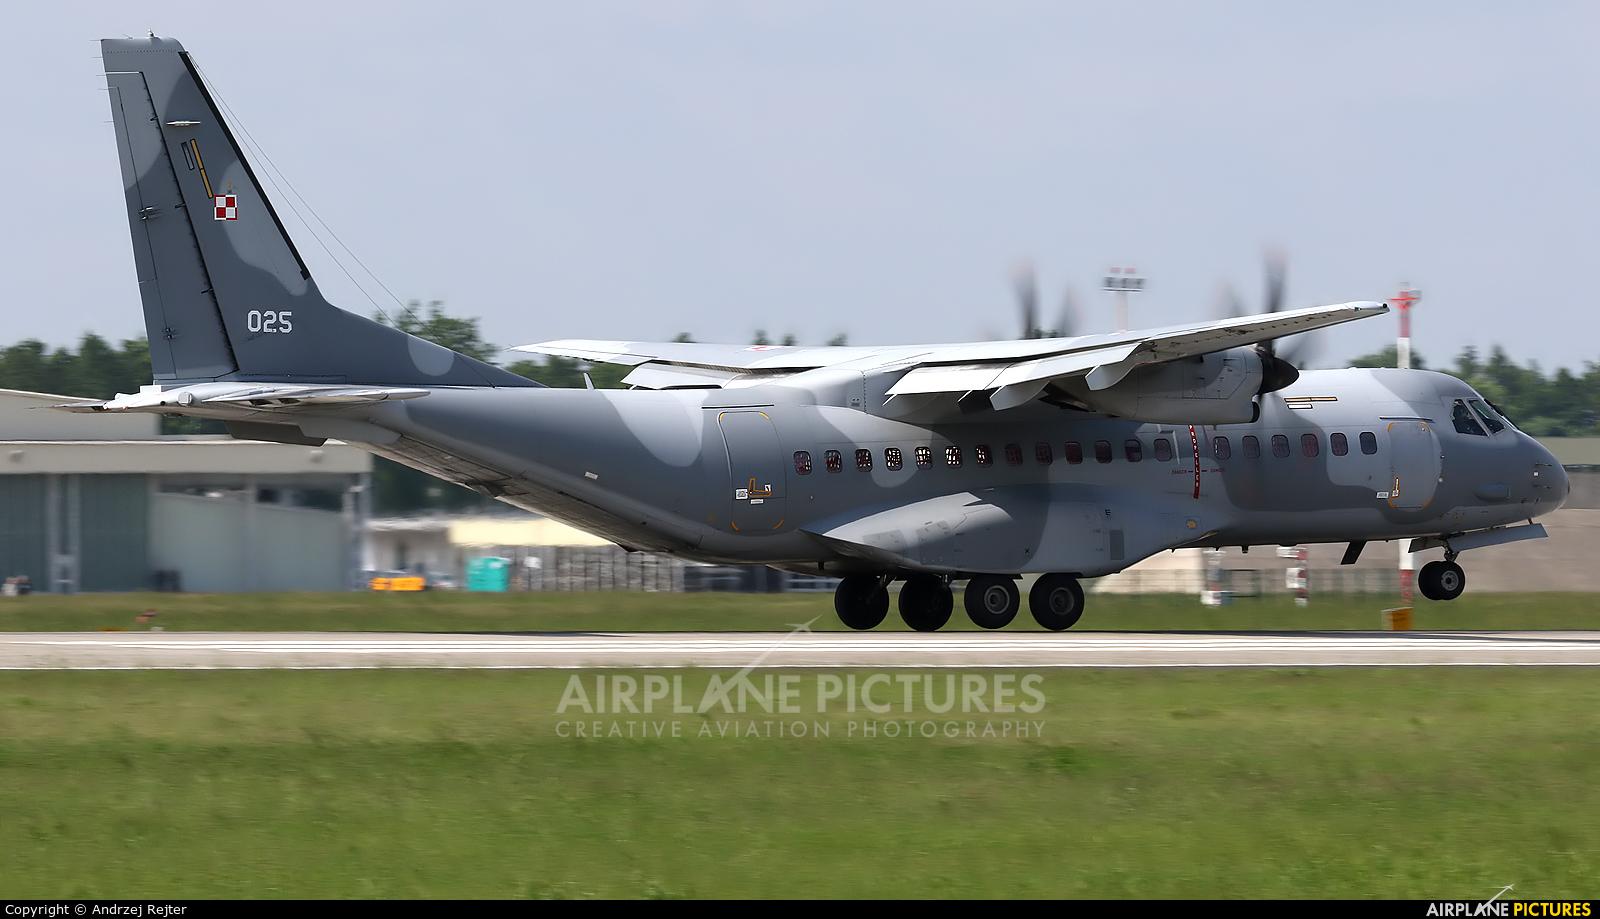 Poland - Air Force 025 aircraft at Poznań - Krzesiny